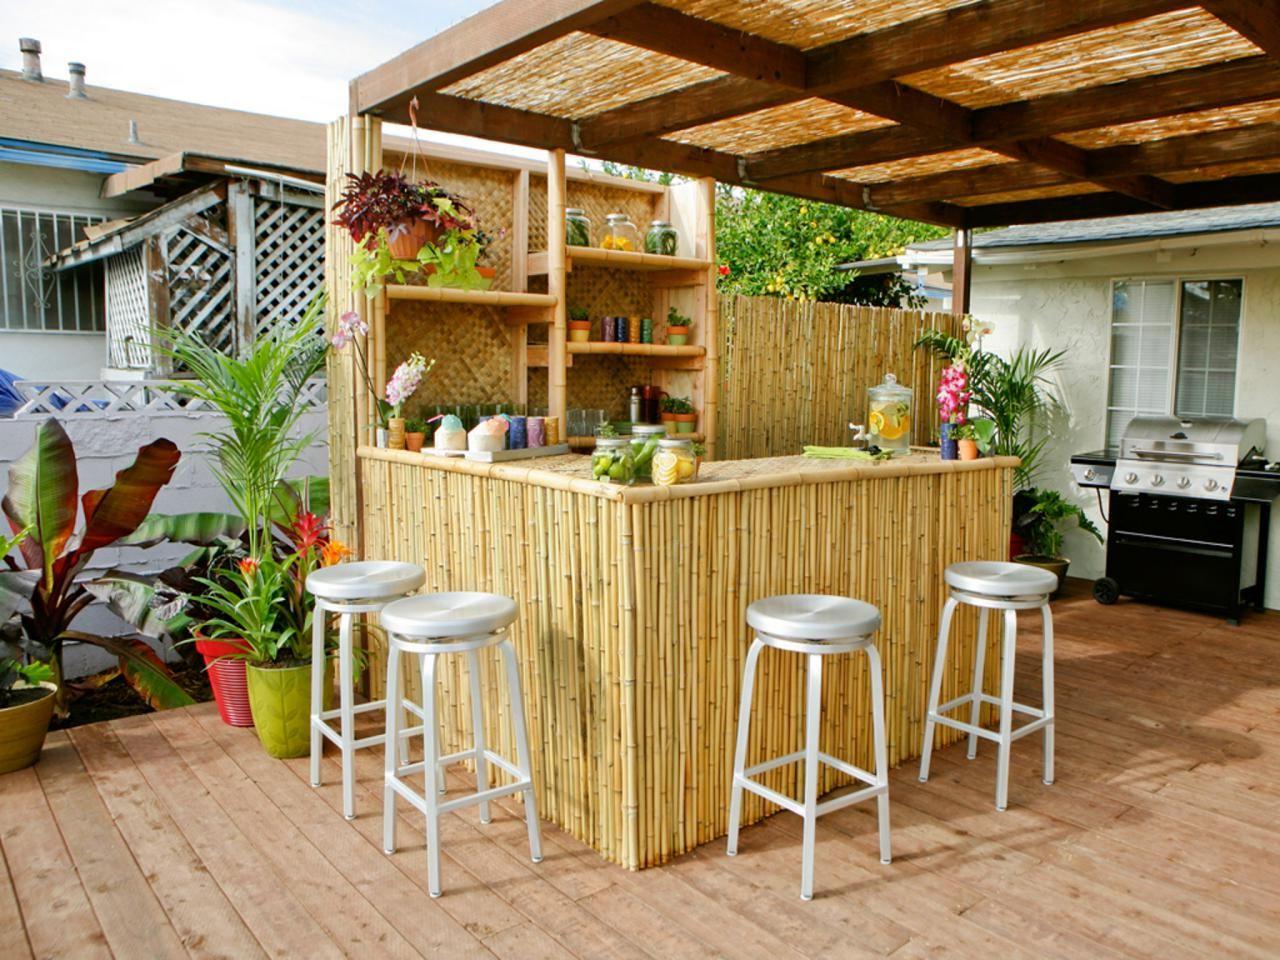 Desain Cafe Minimalist Yang Akan Membuat Pengunjung Kamu Betah Berlama Lama Atzeeco